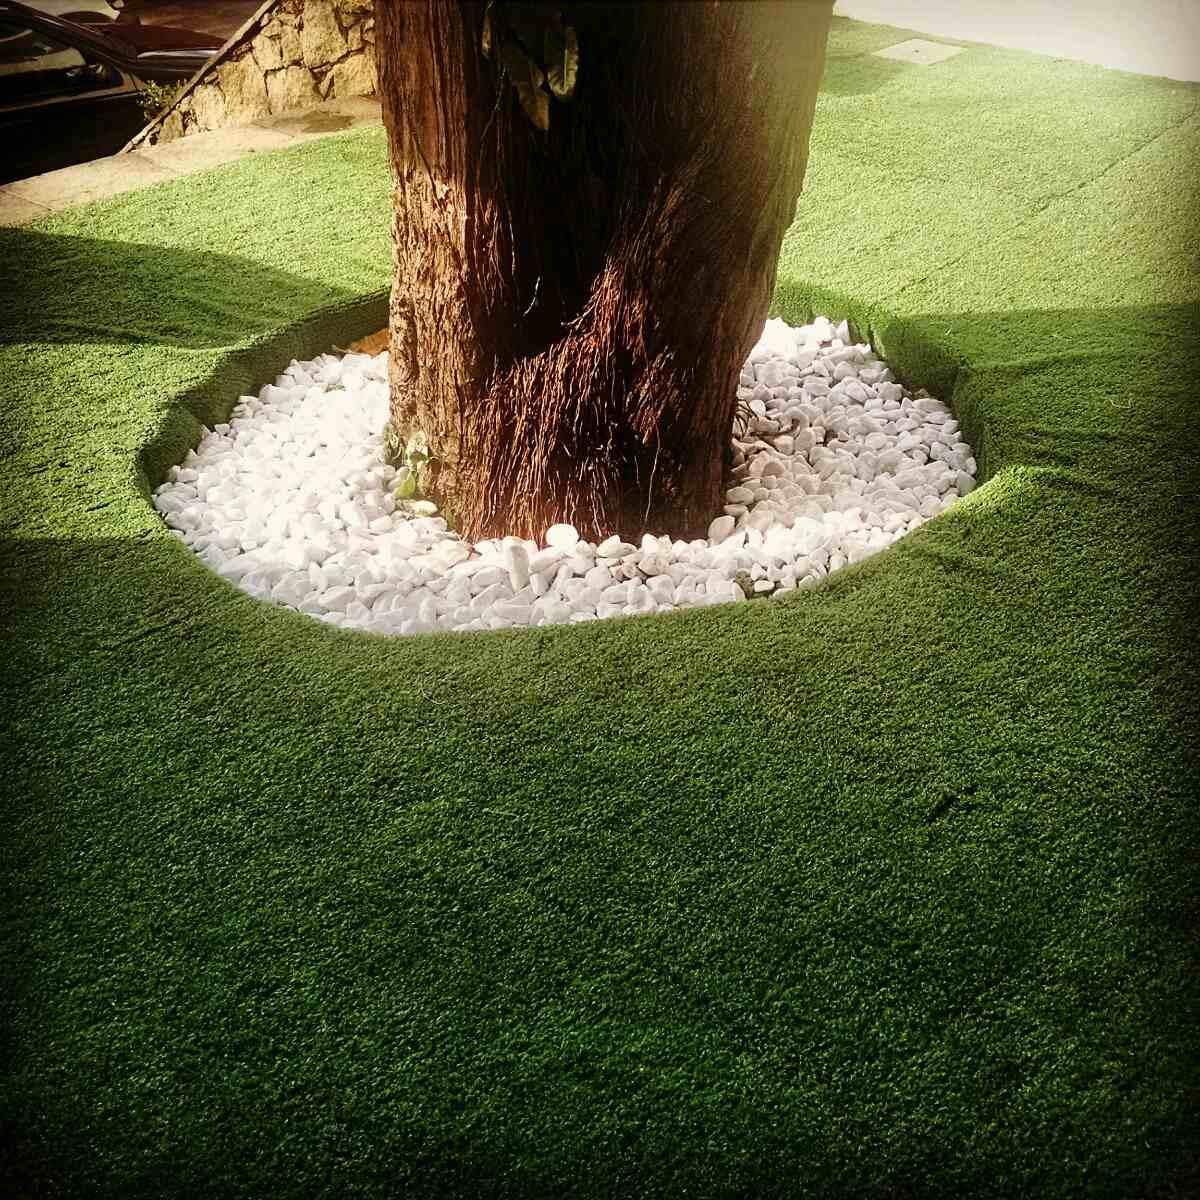 grama sintetica para jardim mercadolivre:Grama Sintética Decorativa 20mm Jardinagem, Decoração, Stand – R$